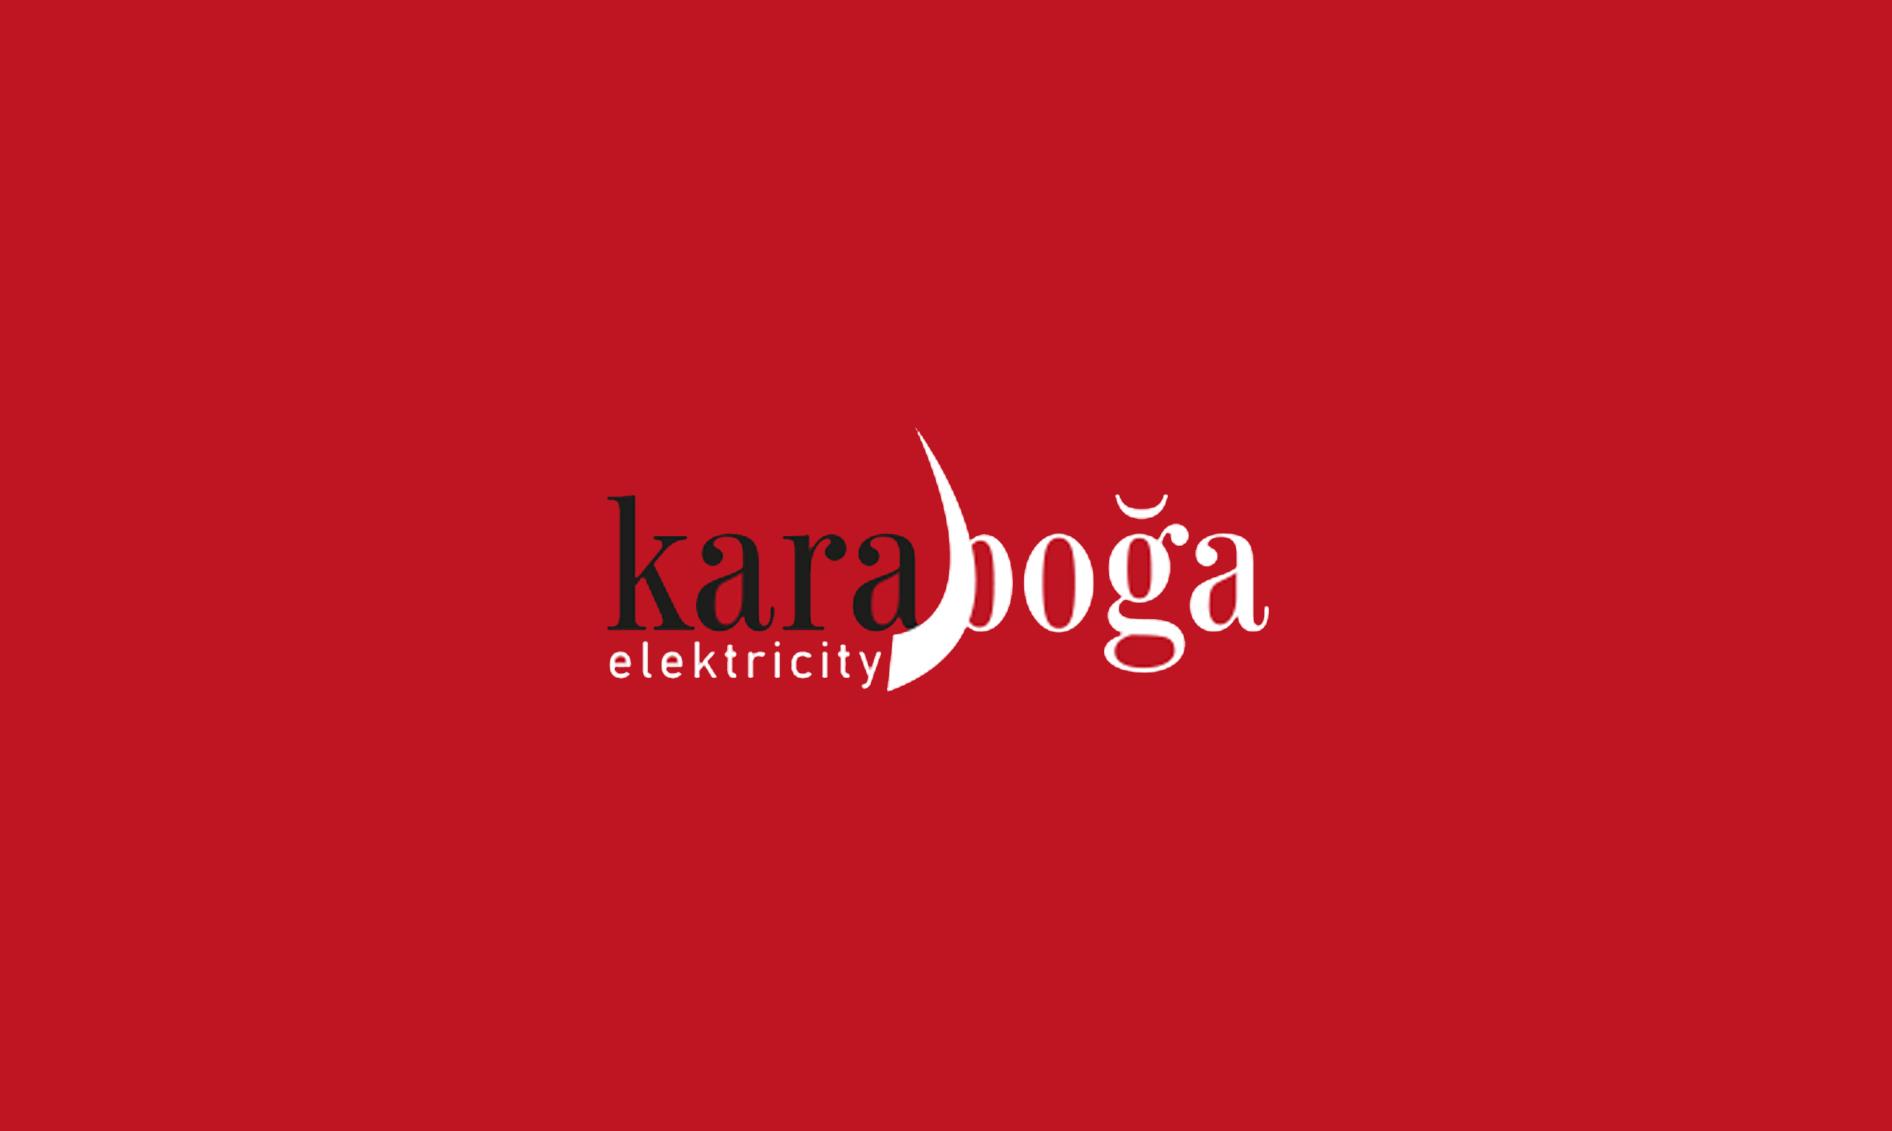 Karaboğa Elecricity